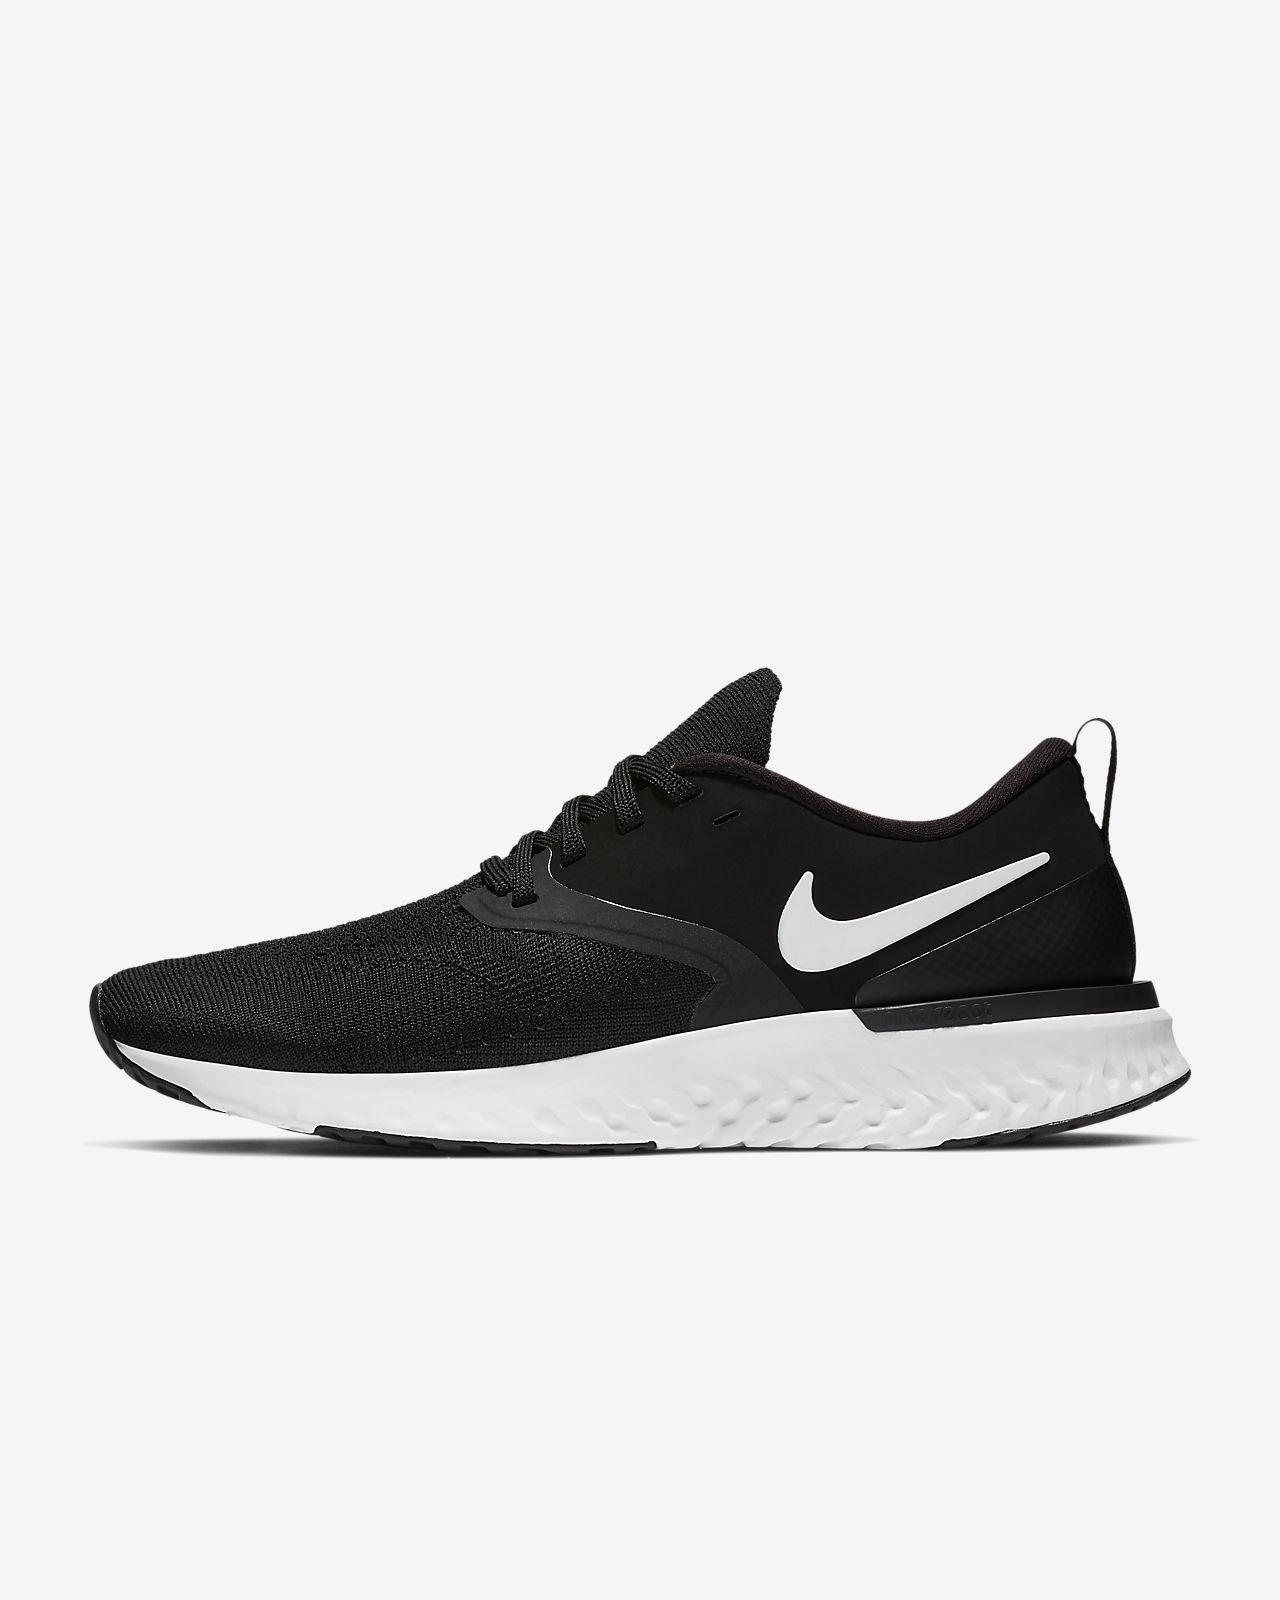 sale retailer 7e3b0 7fe4f Nike Odyssey React Flyknit 2 Women's Running Shoe